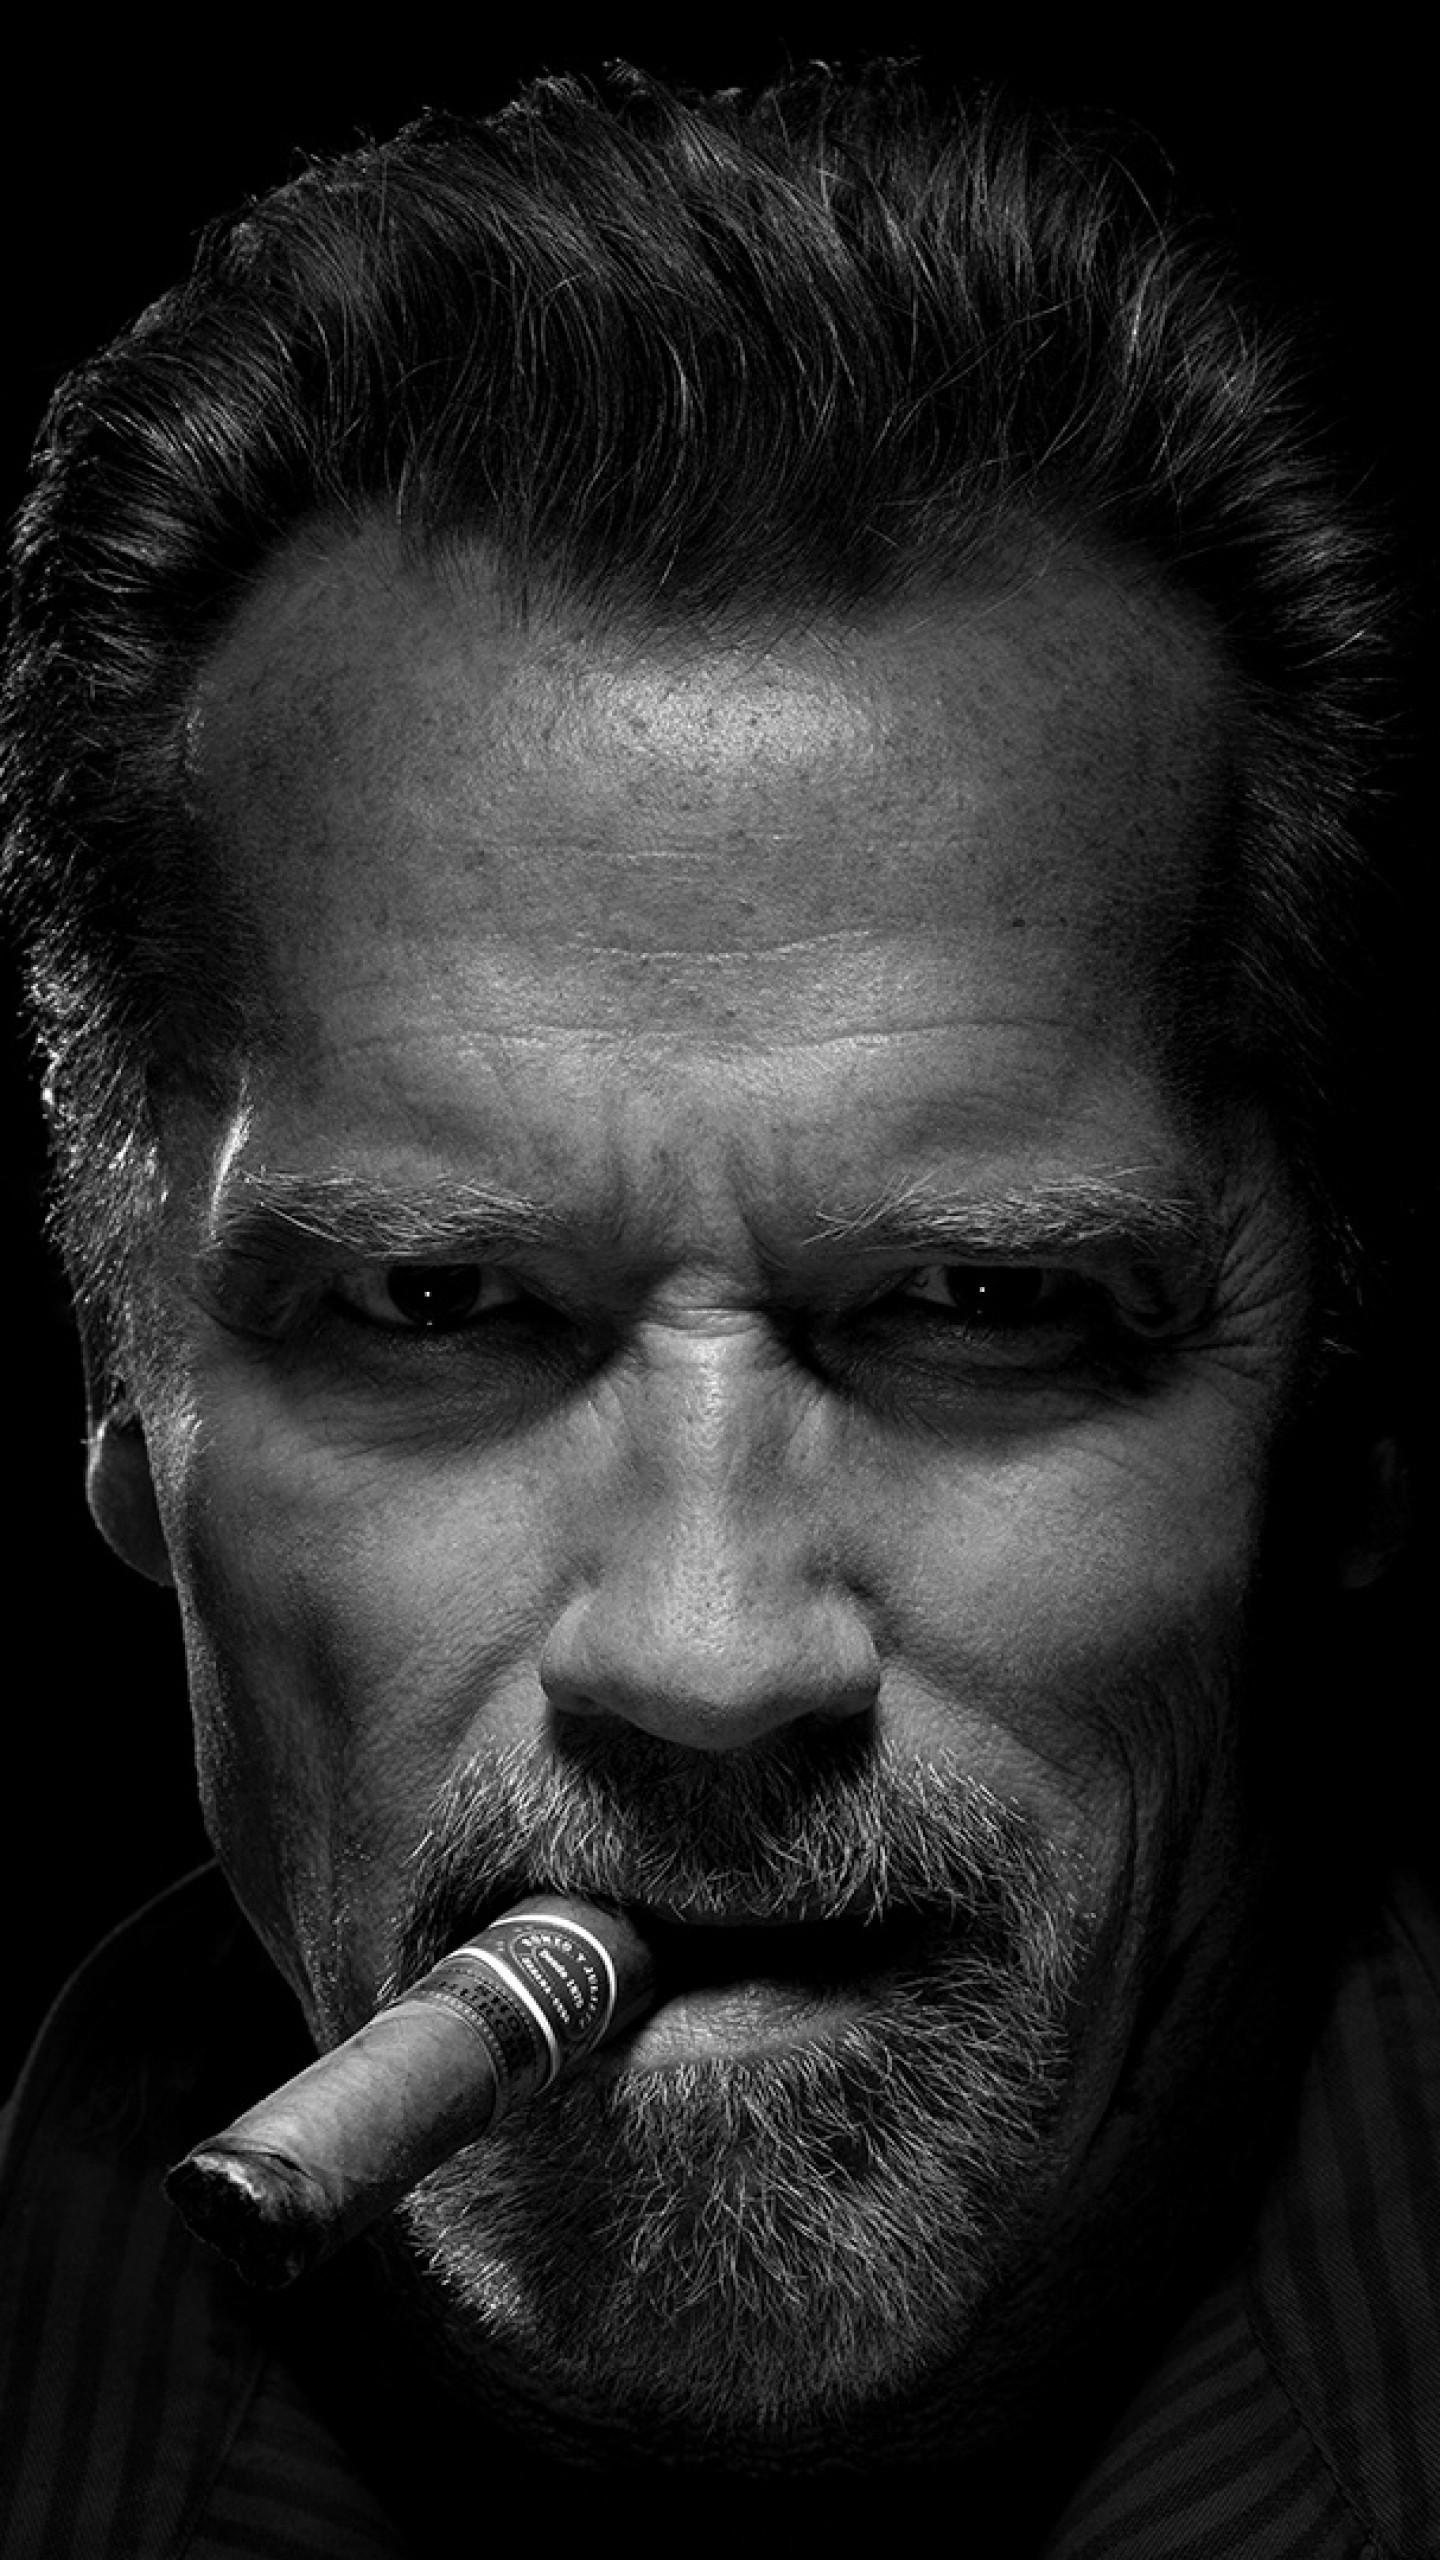 Iphone 4 Car Wallpapers Arnold Schwarzenegger Wallpaper 75 Images